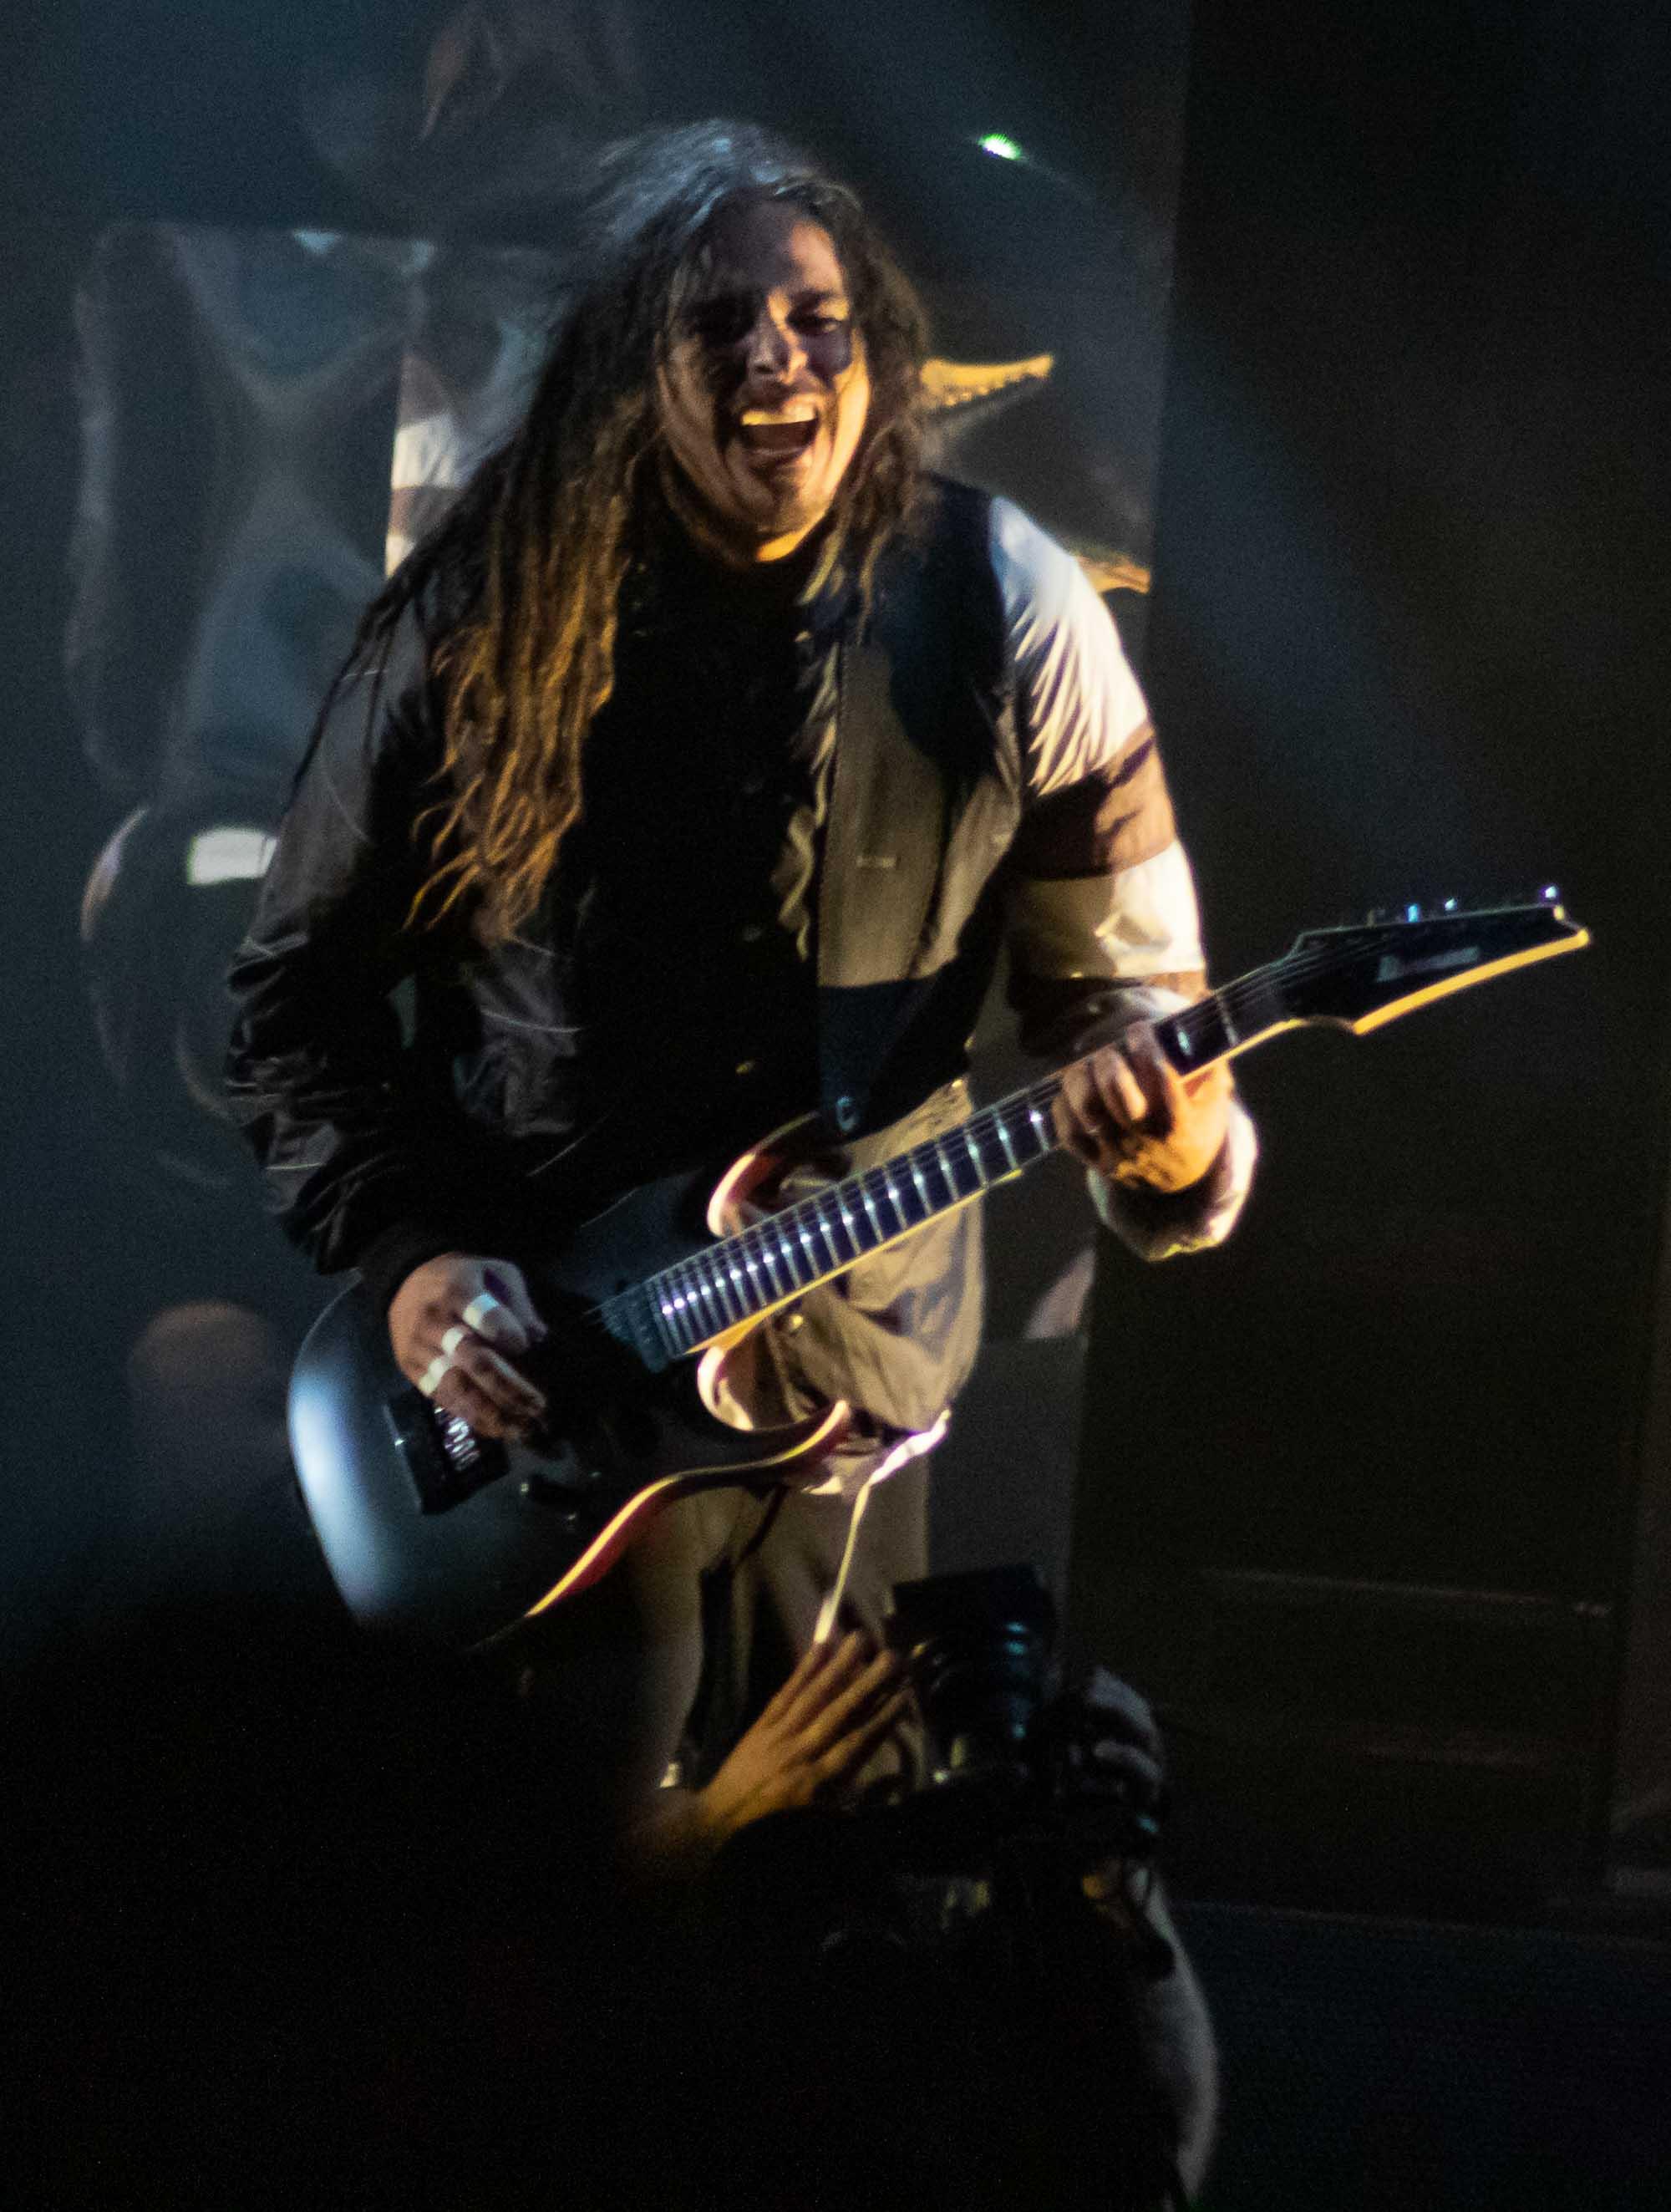 Korn-BudweiserStage-Toronto_Ontario-20190814-JeremyGretzinger13